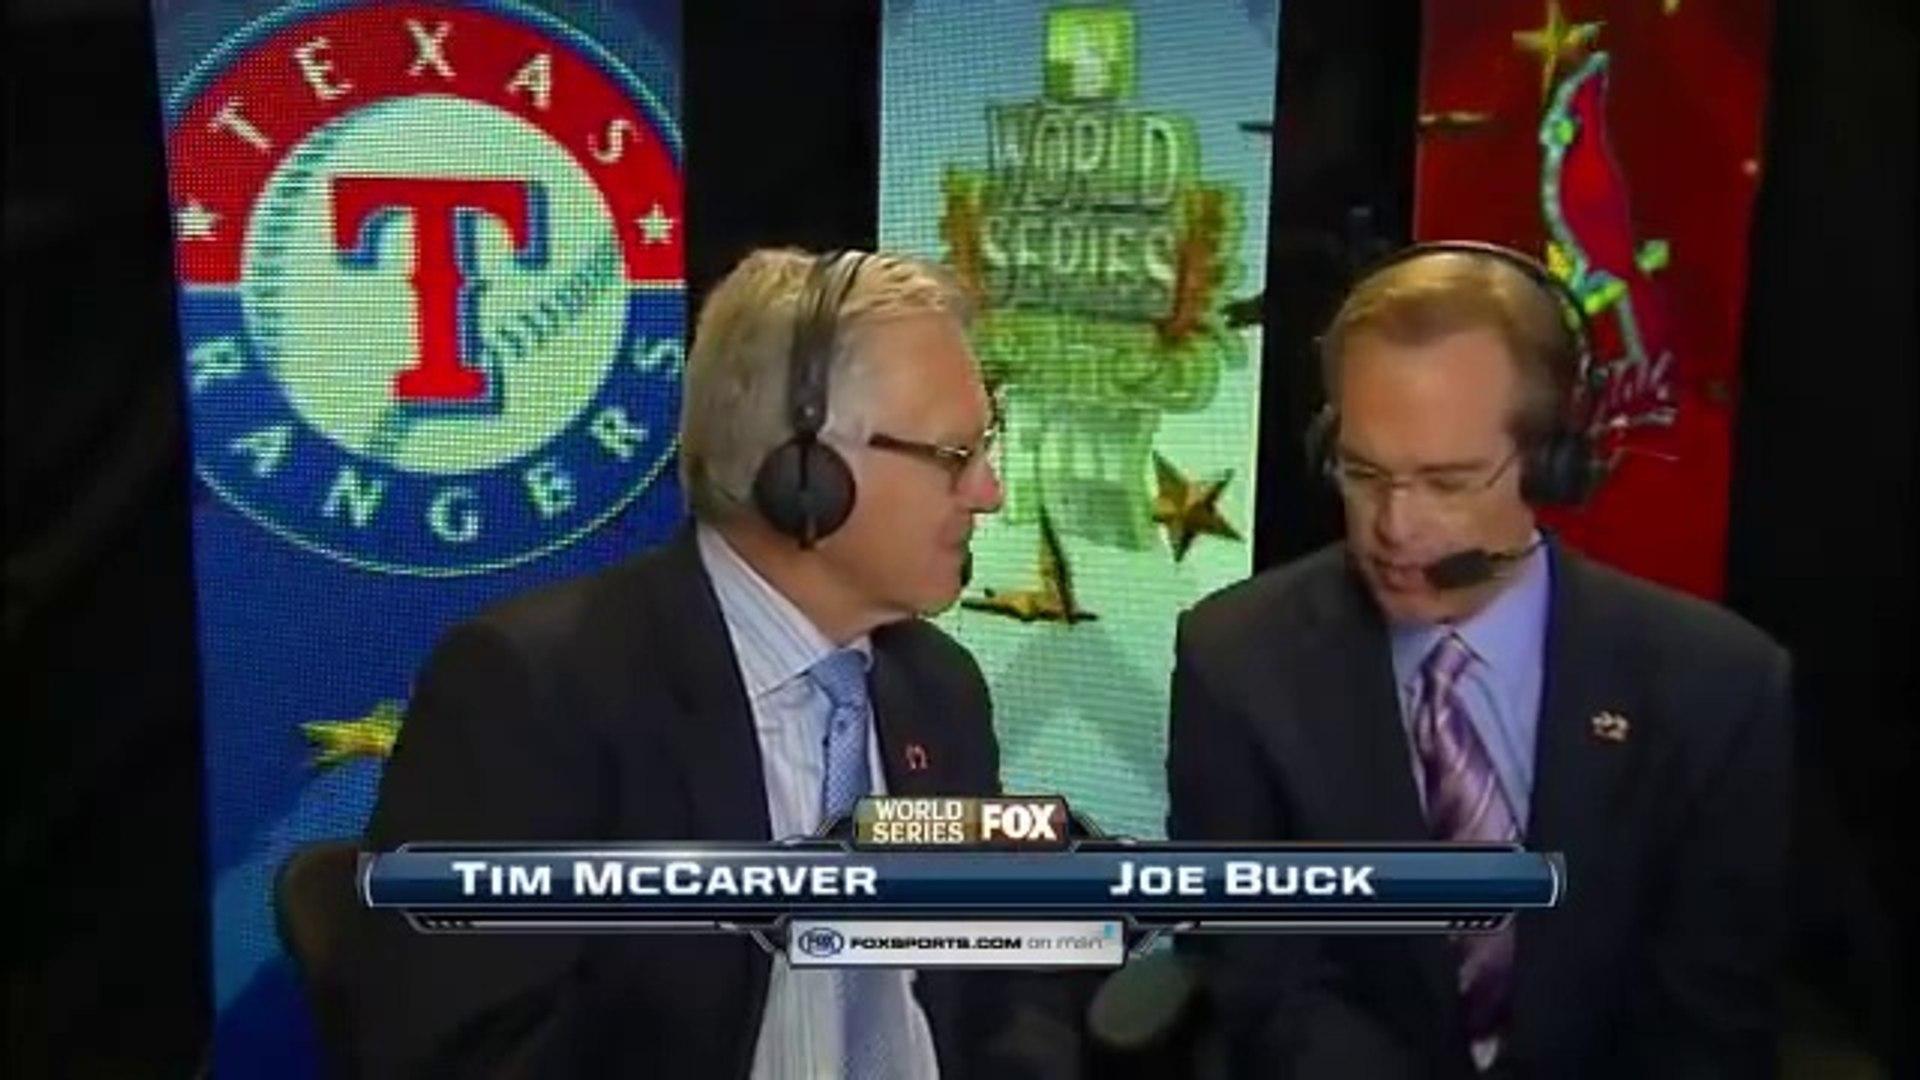 MLB 2011 World Series G7 - St. Louis Cardinals vs Texas Rangers 2011-10-28